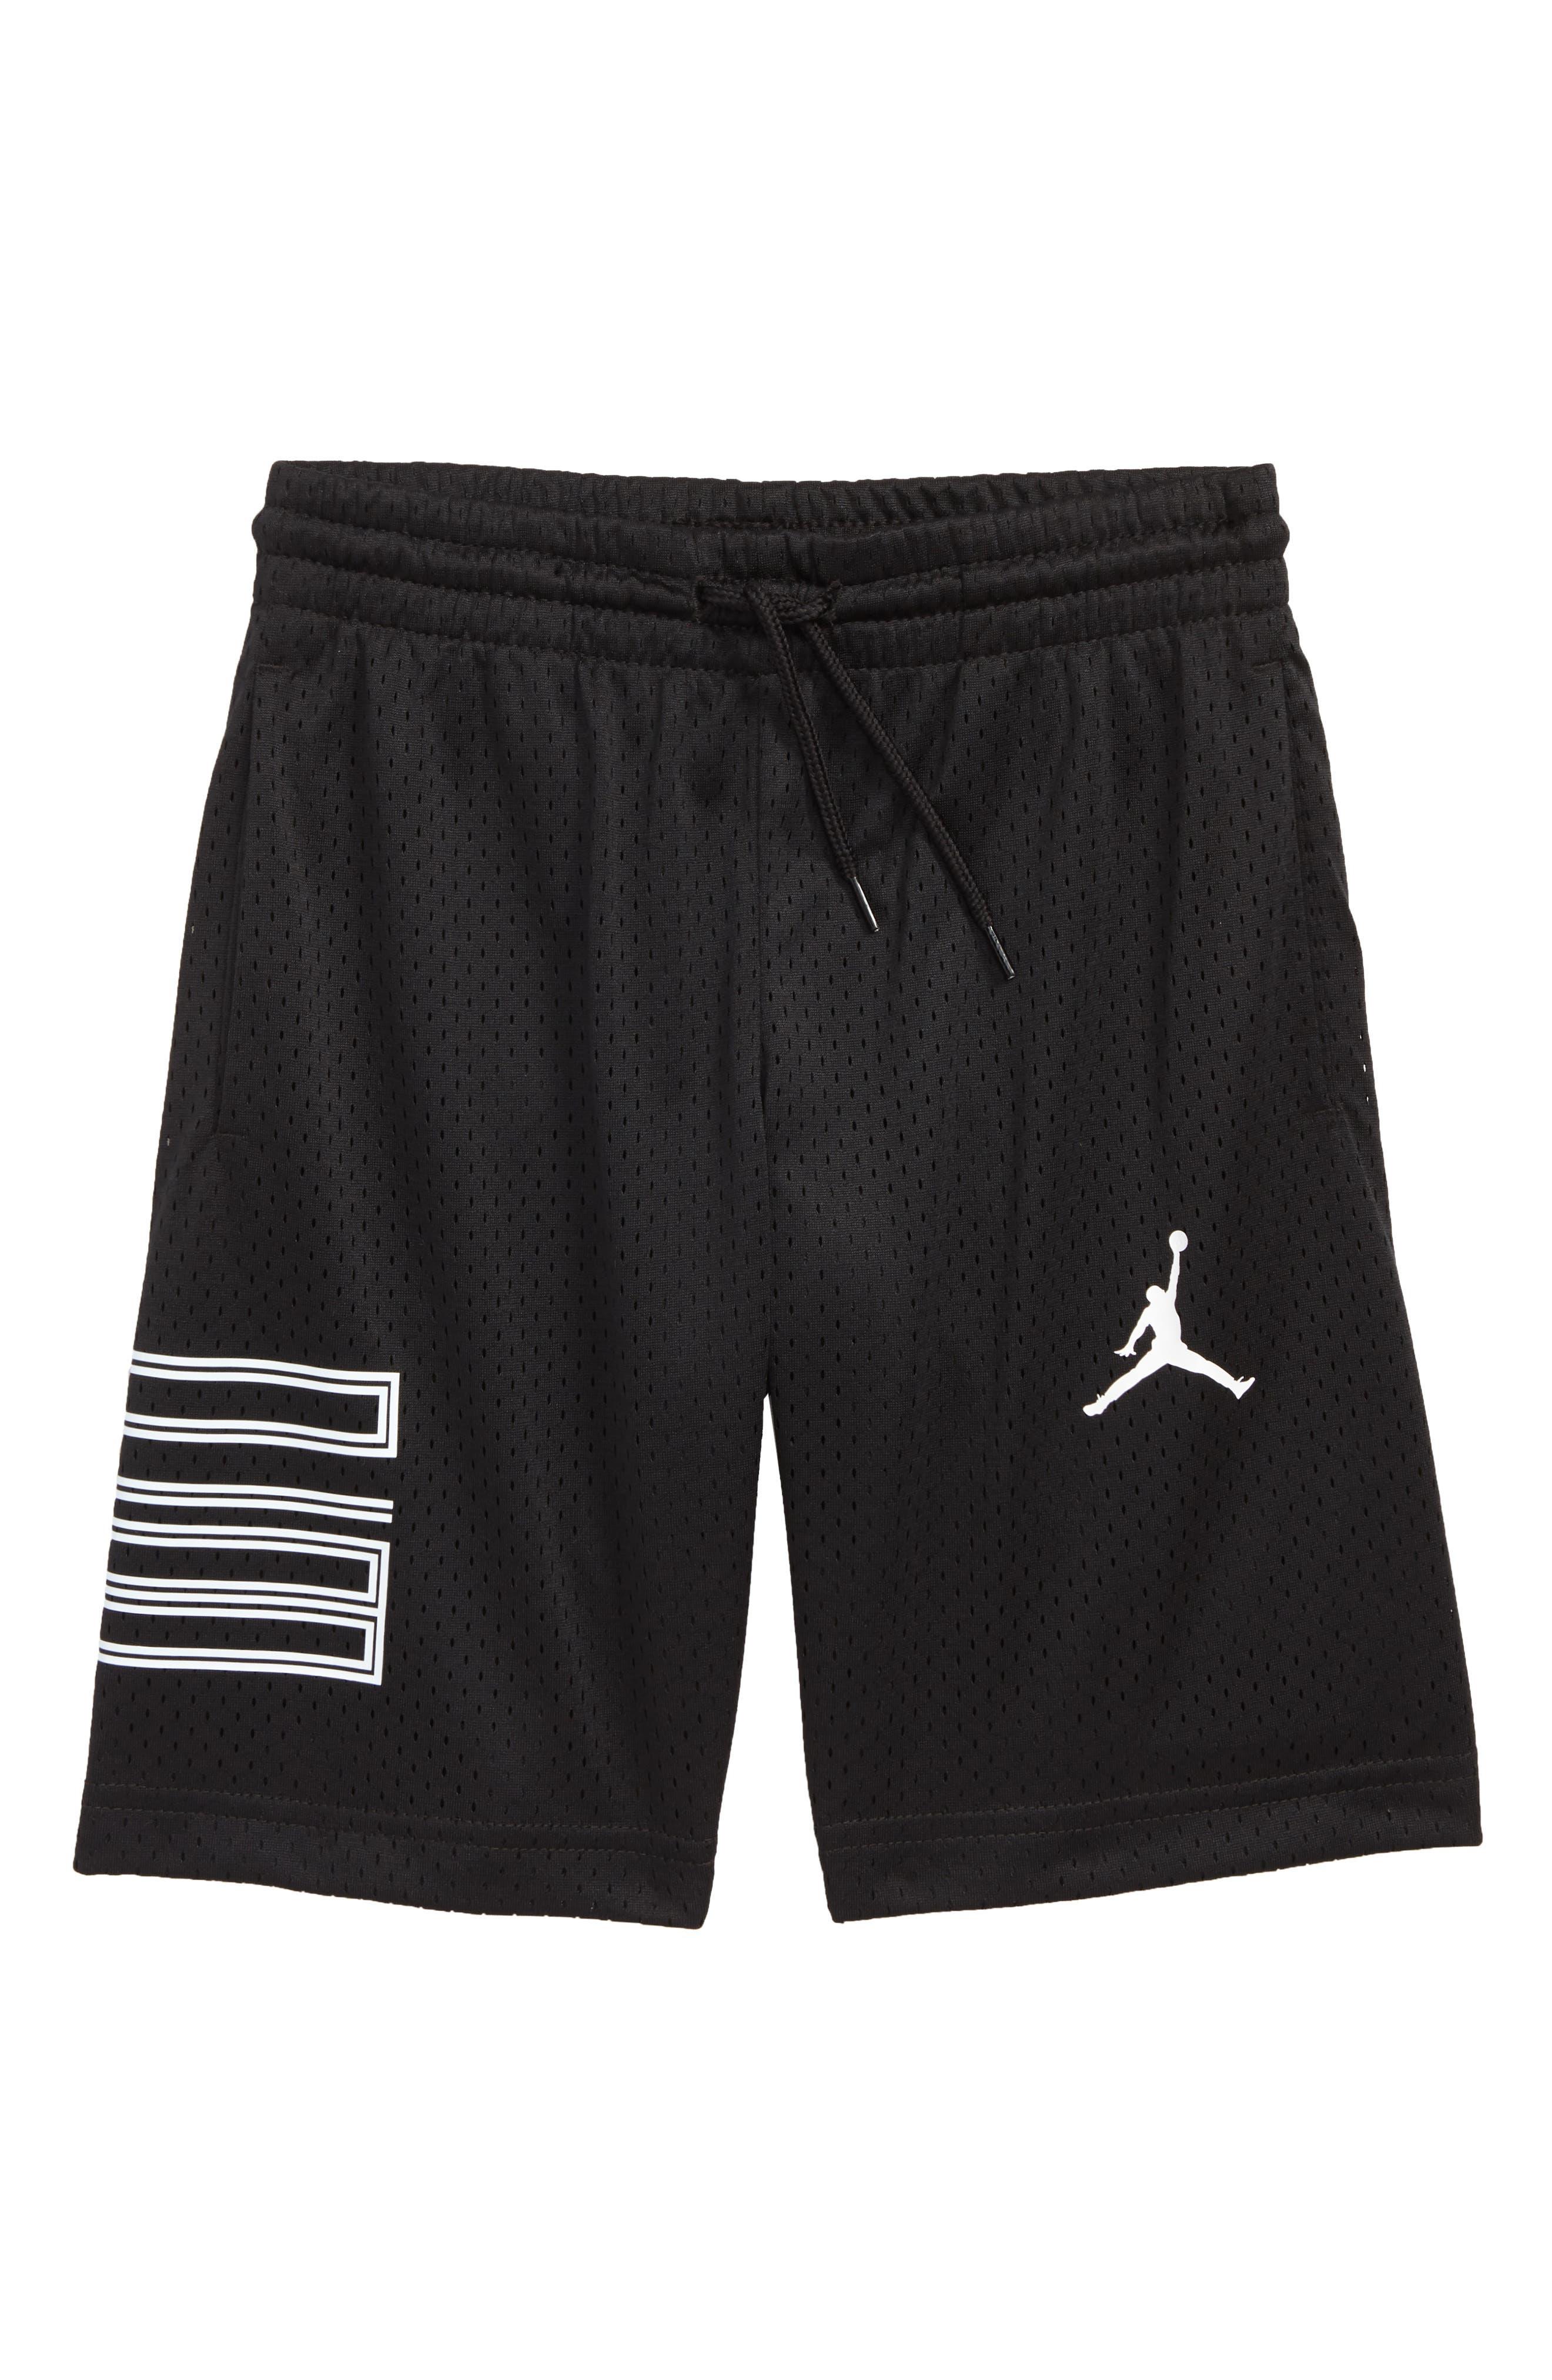 AJ11 Flight Mesh Shorts,                         Main,                         color, 004